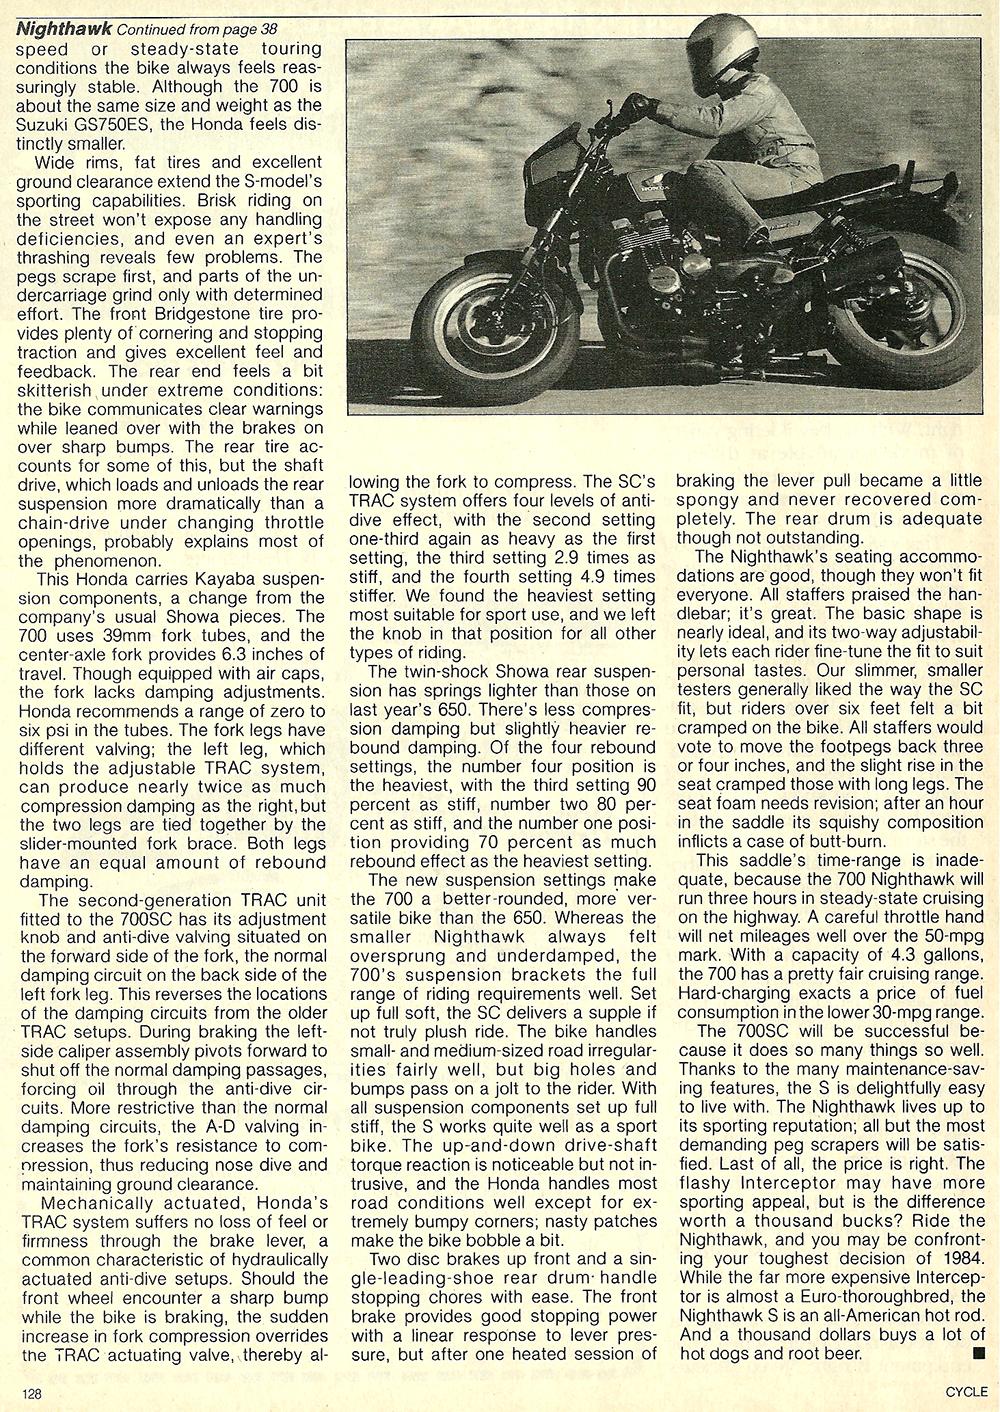 1984 Honda CB700SC Nighthawk S road test 8.jpg